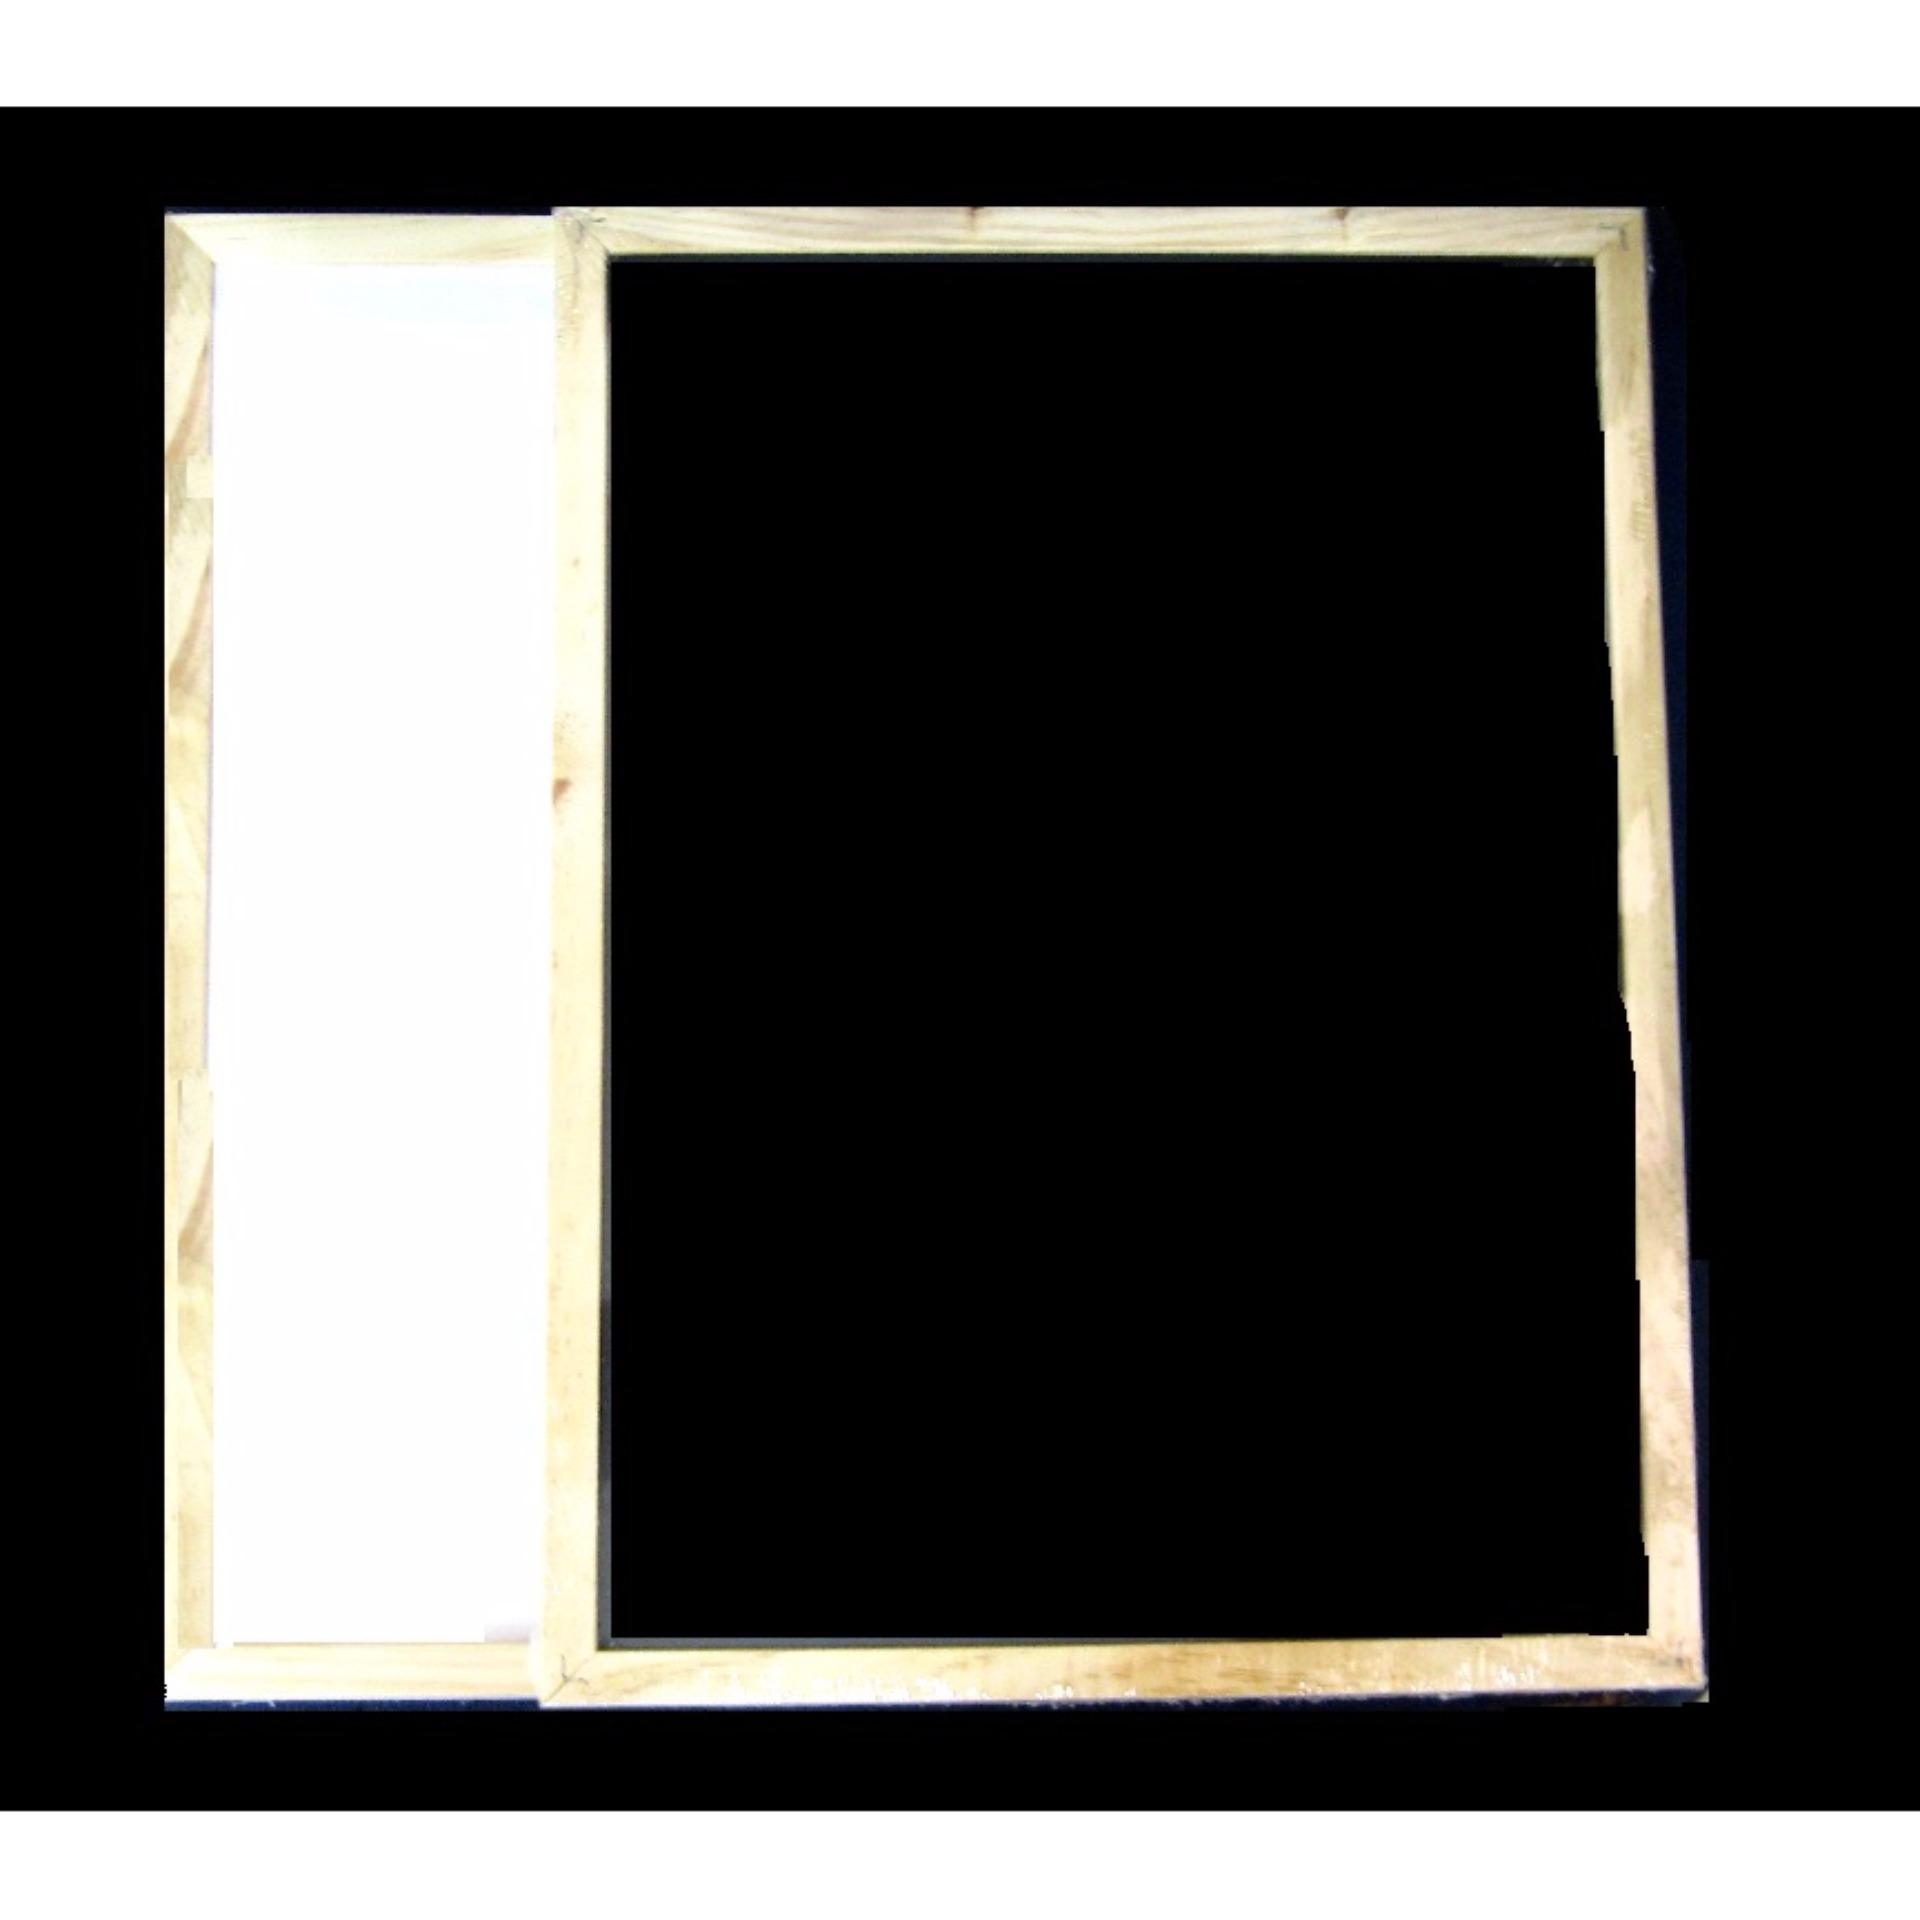 Philippines | Whiteboard/Blackboard Wooden Frame back to back 25 x ...